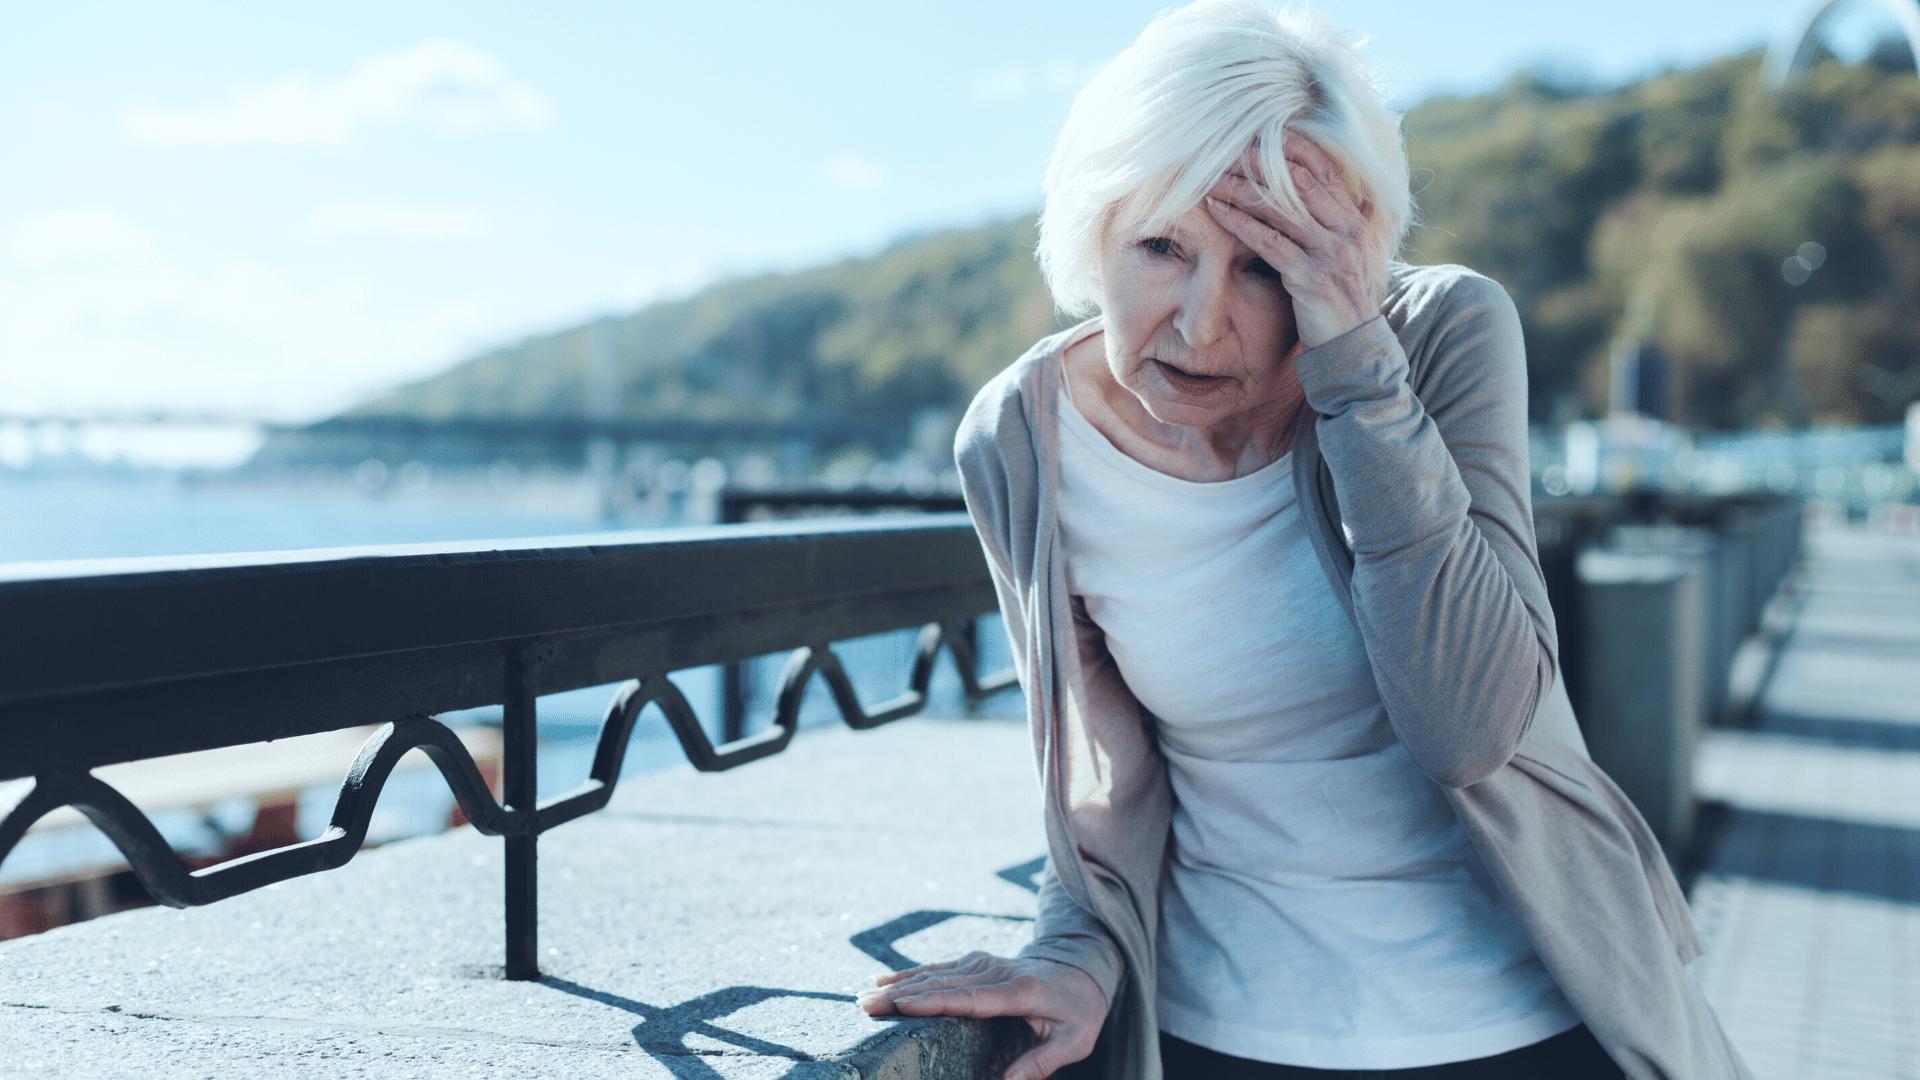 woman dizzy - Treatment for unexplained dizziness or vertigo in women